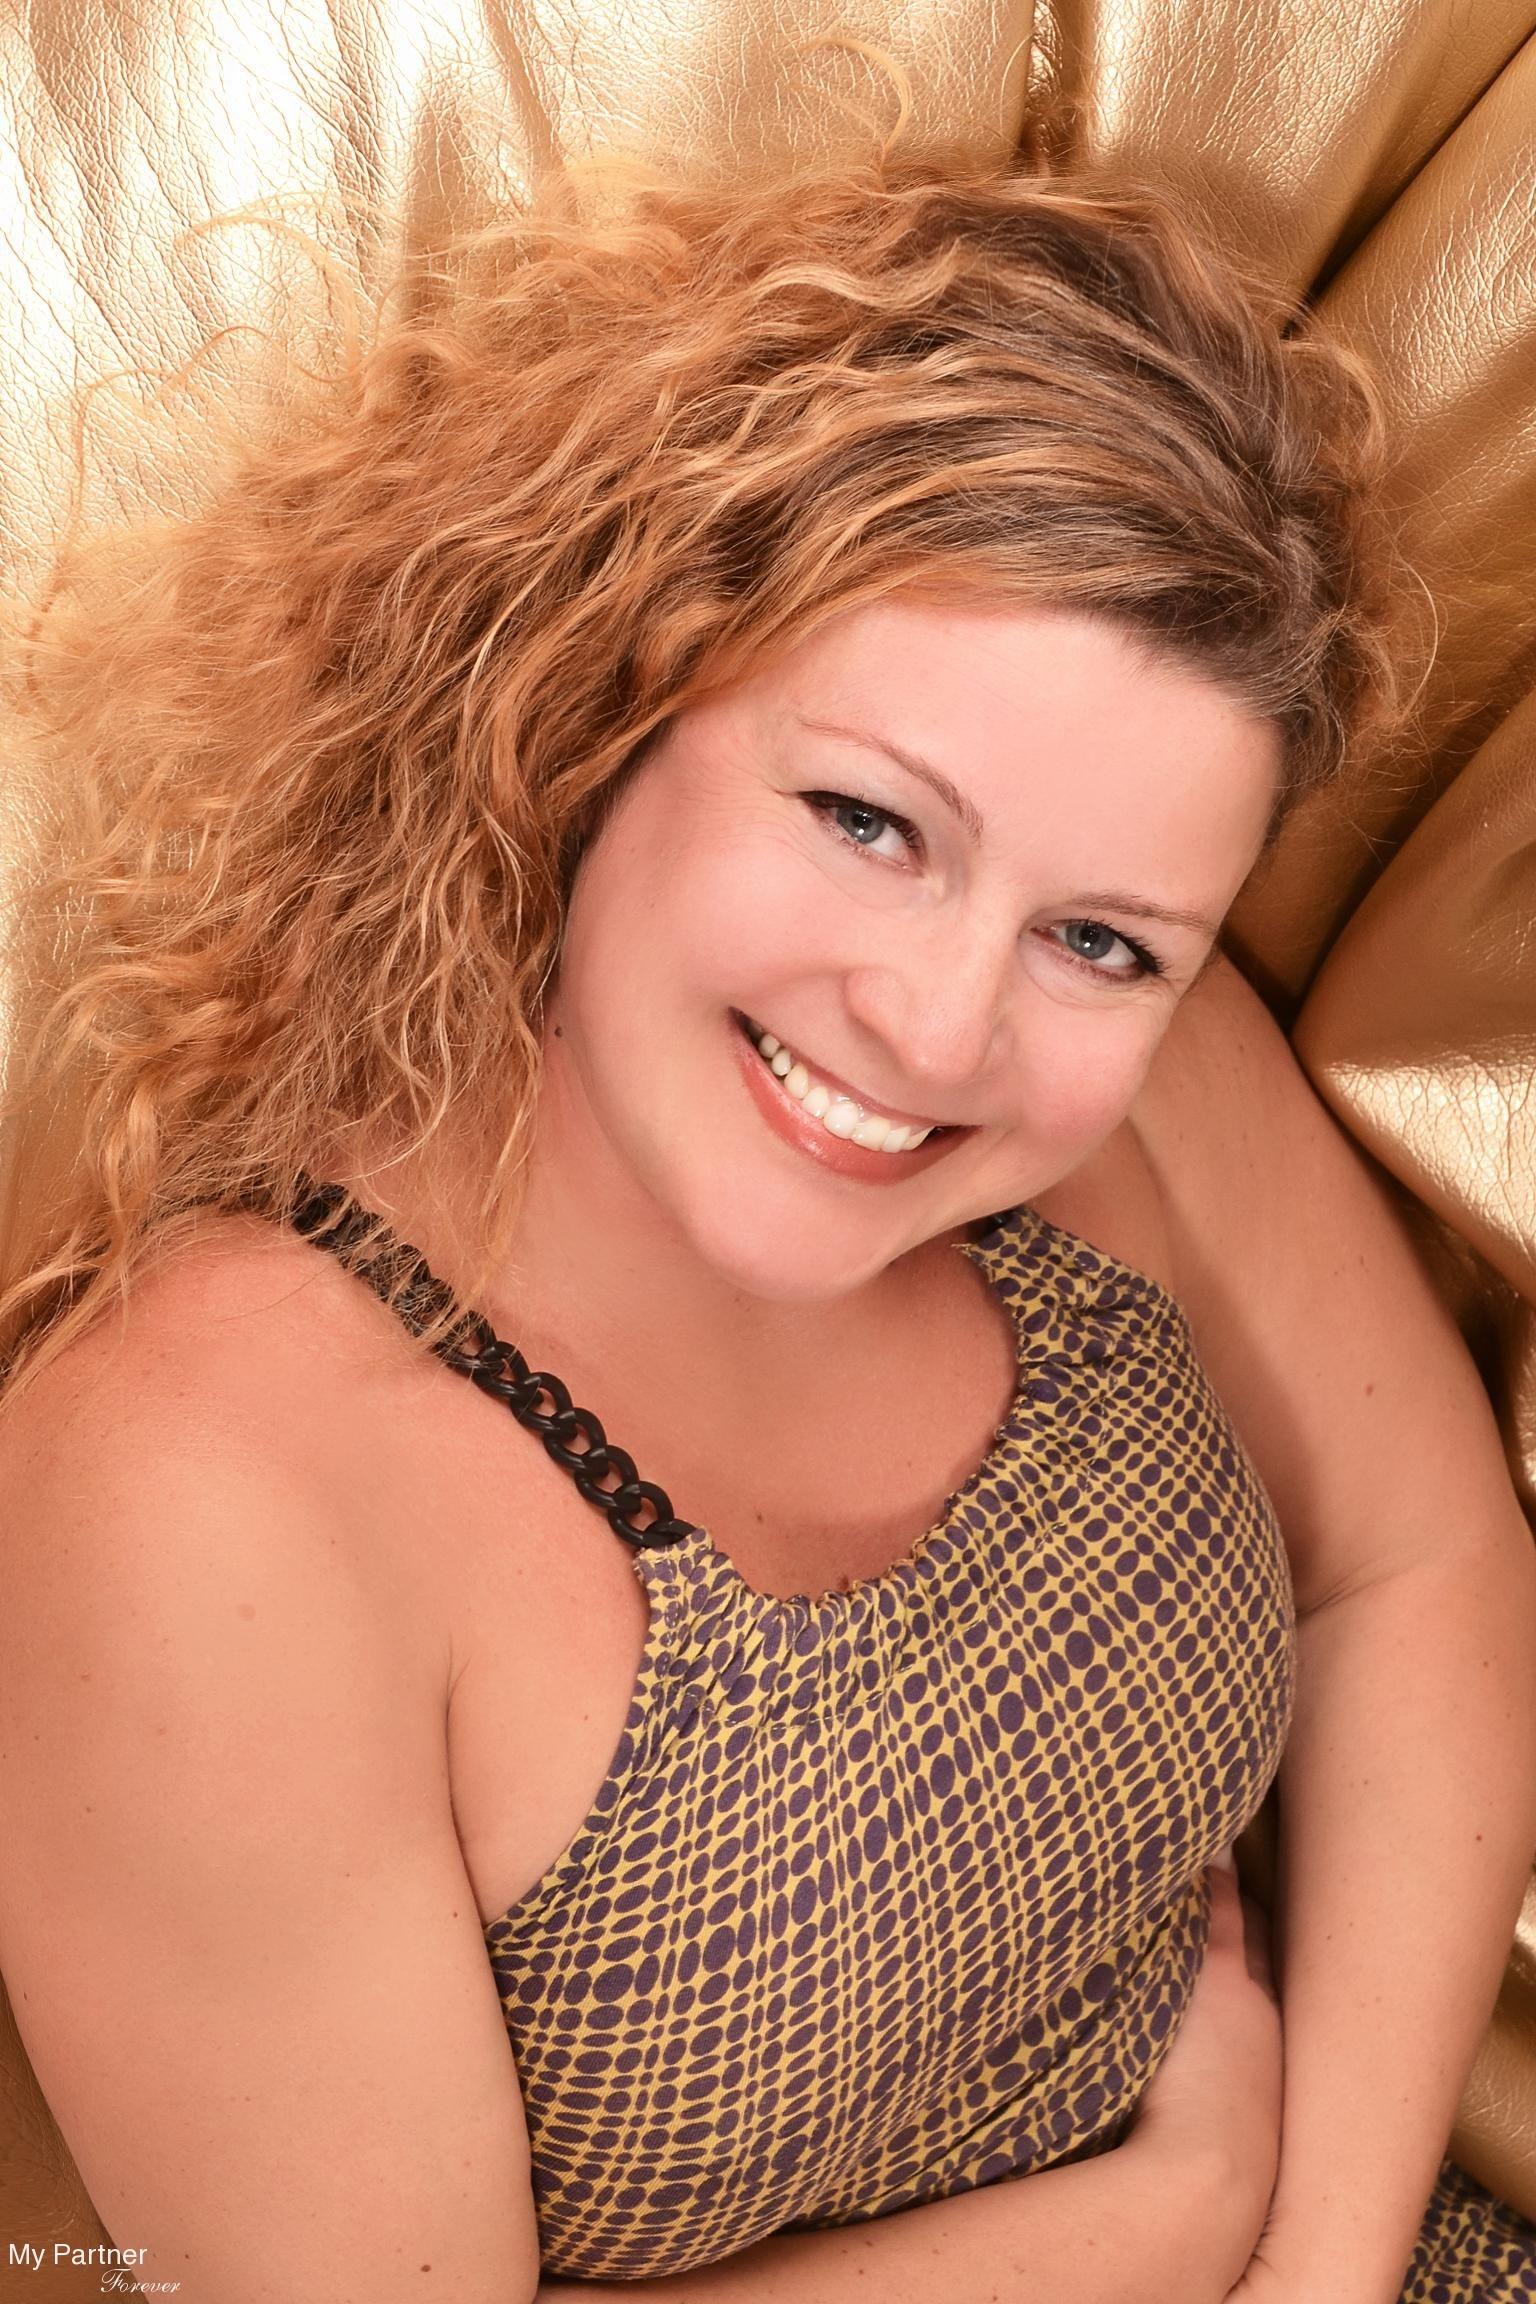 Beautiful Lady from Ukraine - Alina from Kharkov, Ukraine